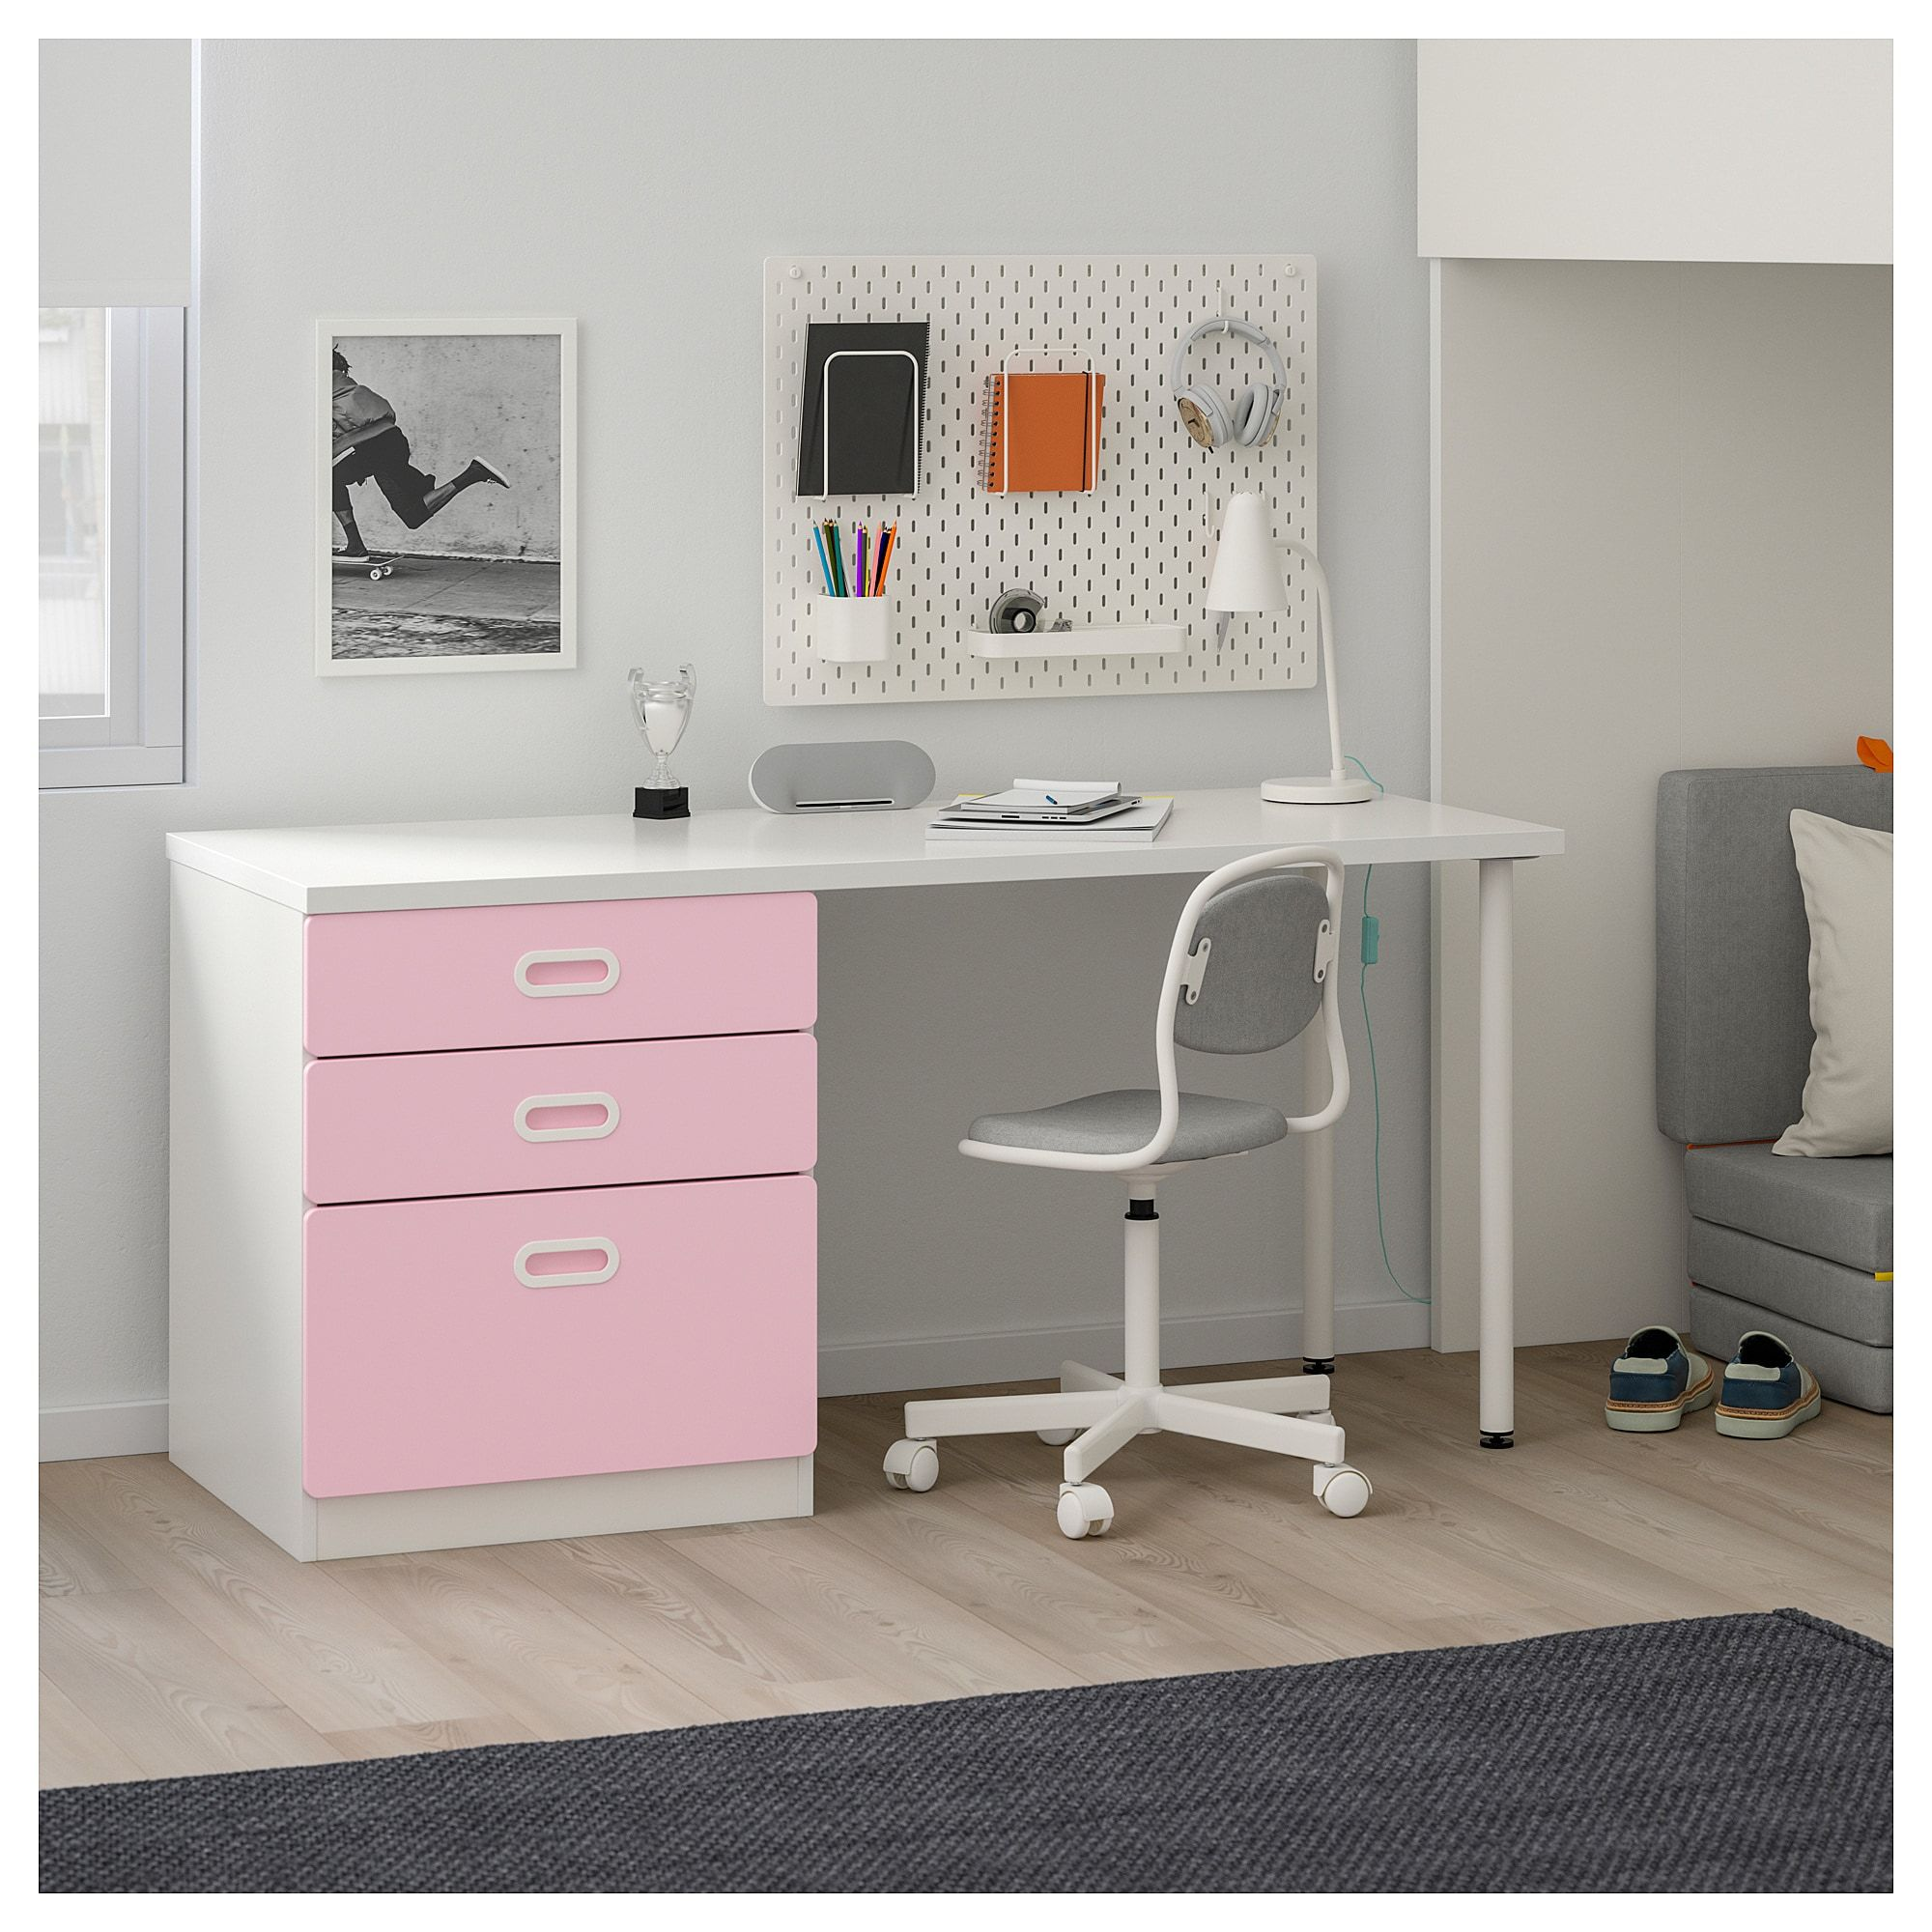 IKEA STUVA / FRITIDS Loft bed with 3 drawers/2 doors